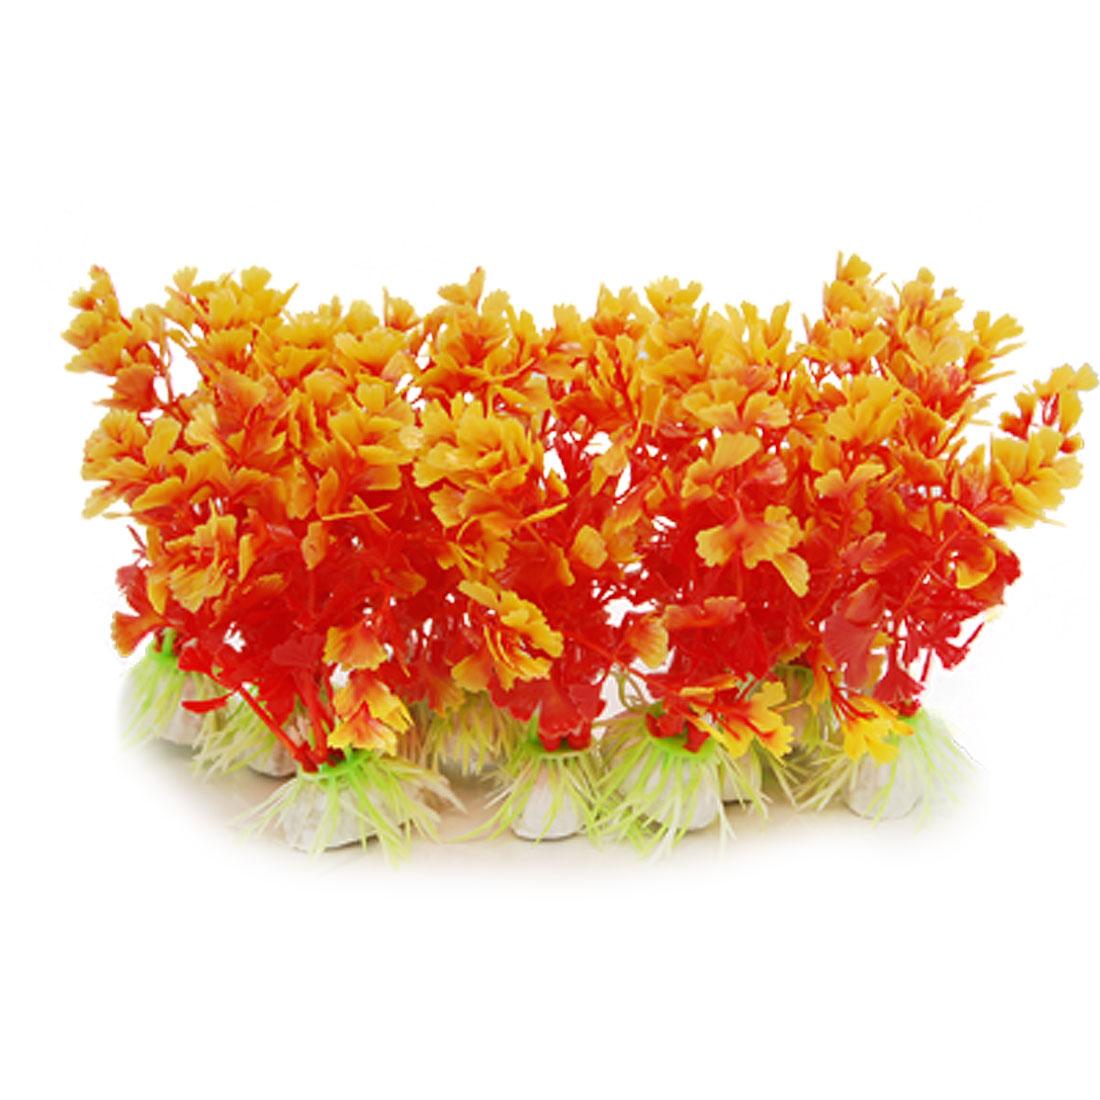 10 x Mini Aquarium Plastic Plants Ornament with Anchor Base